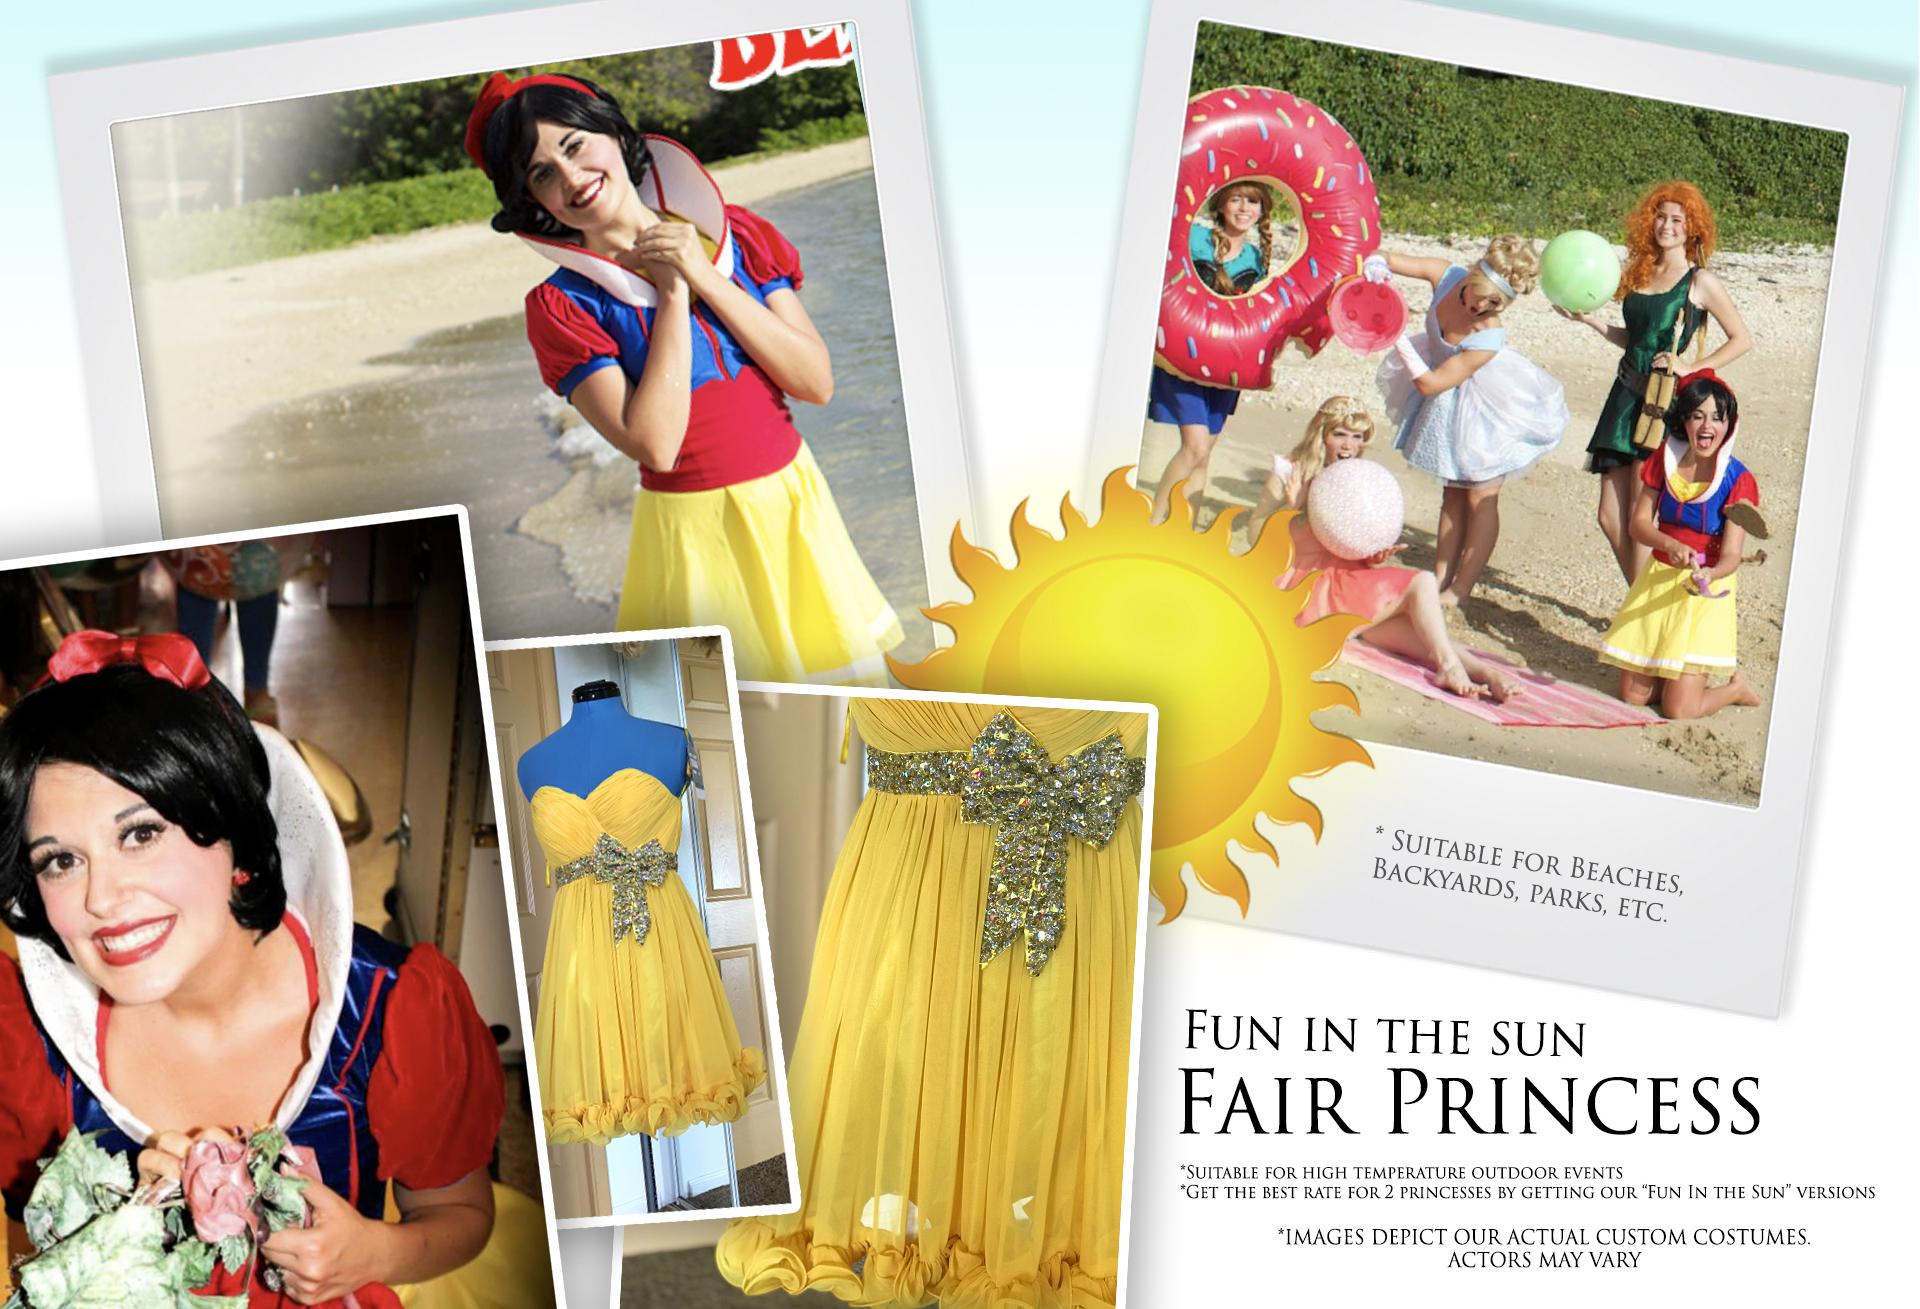 Fun in the Sun Fair Princess